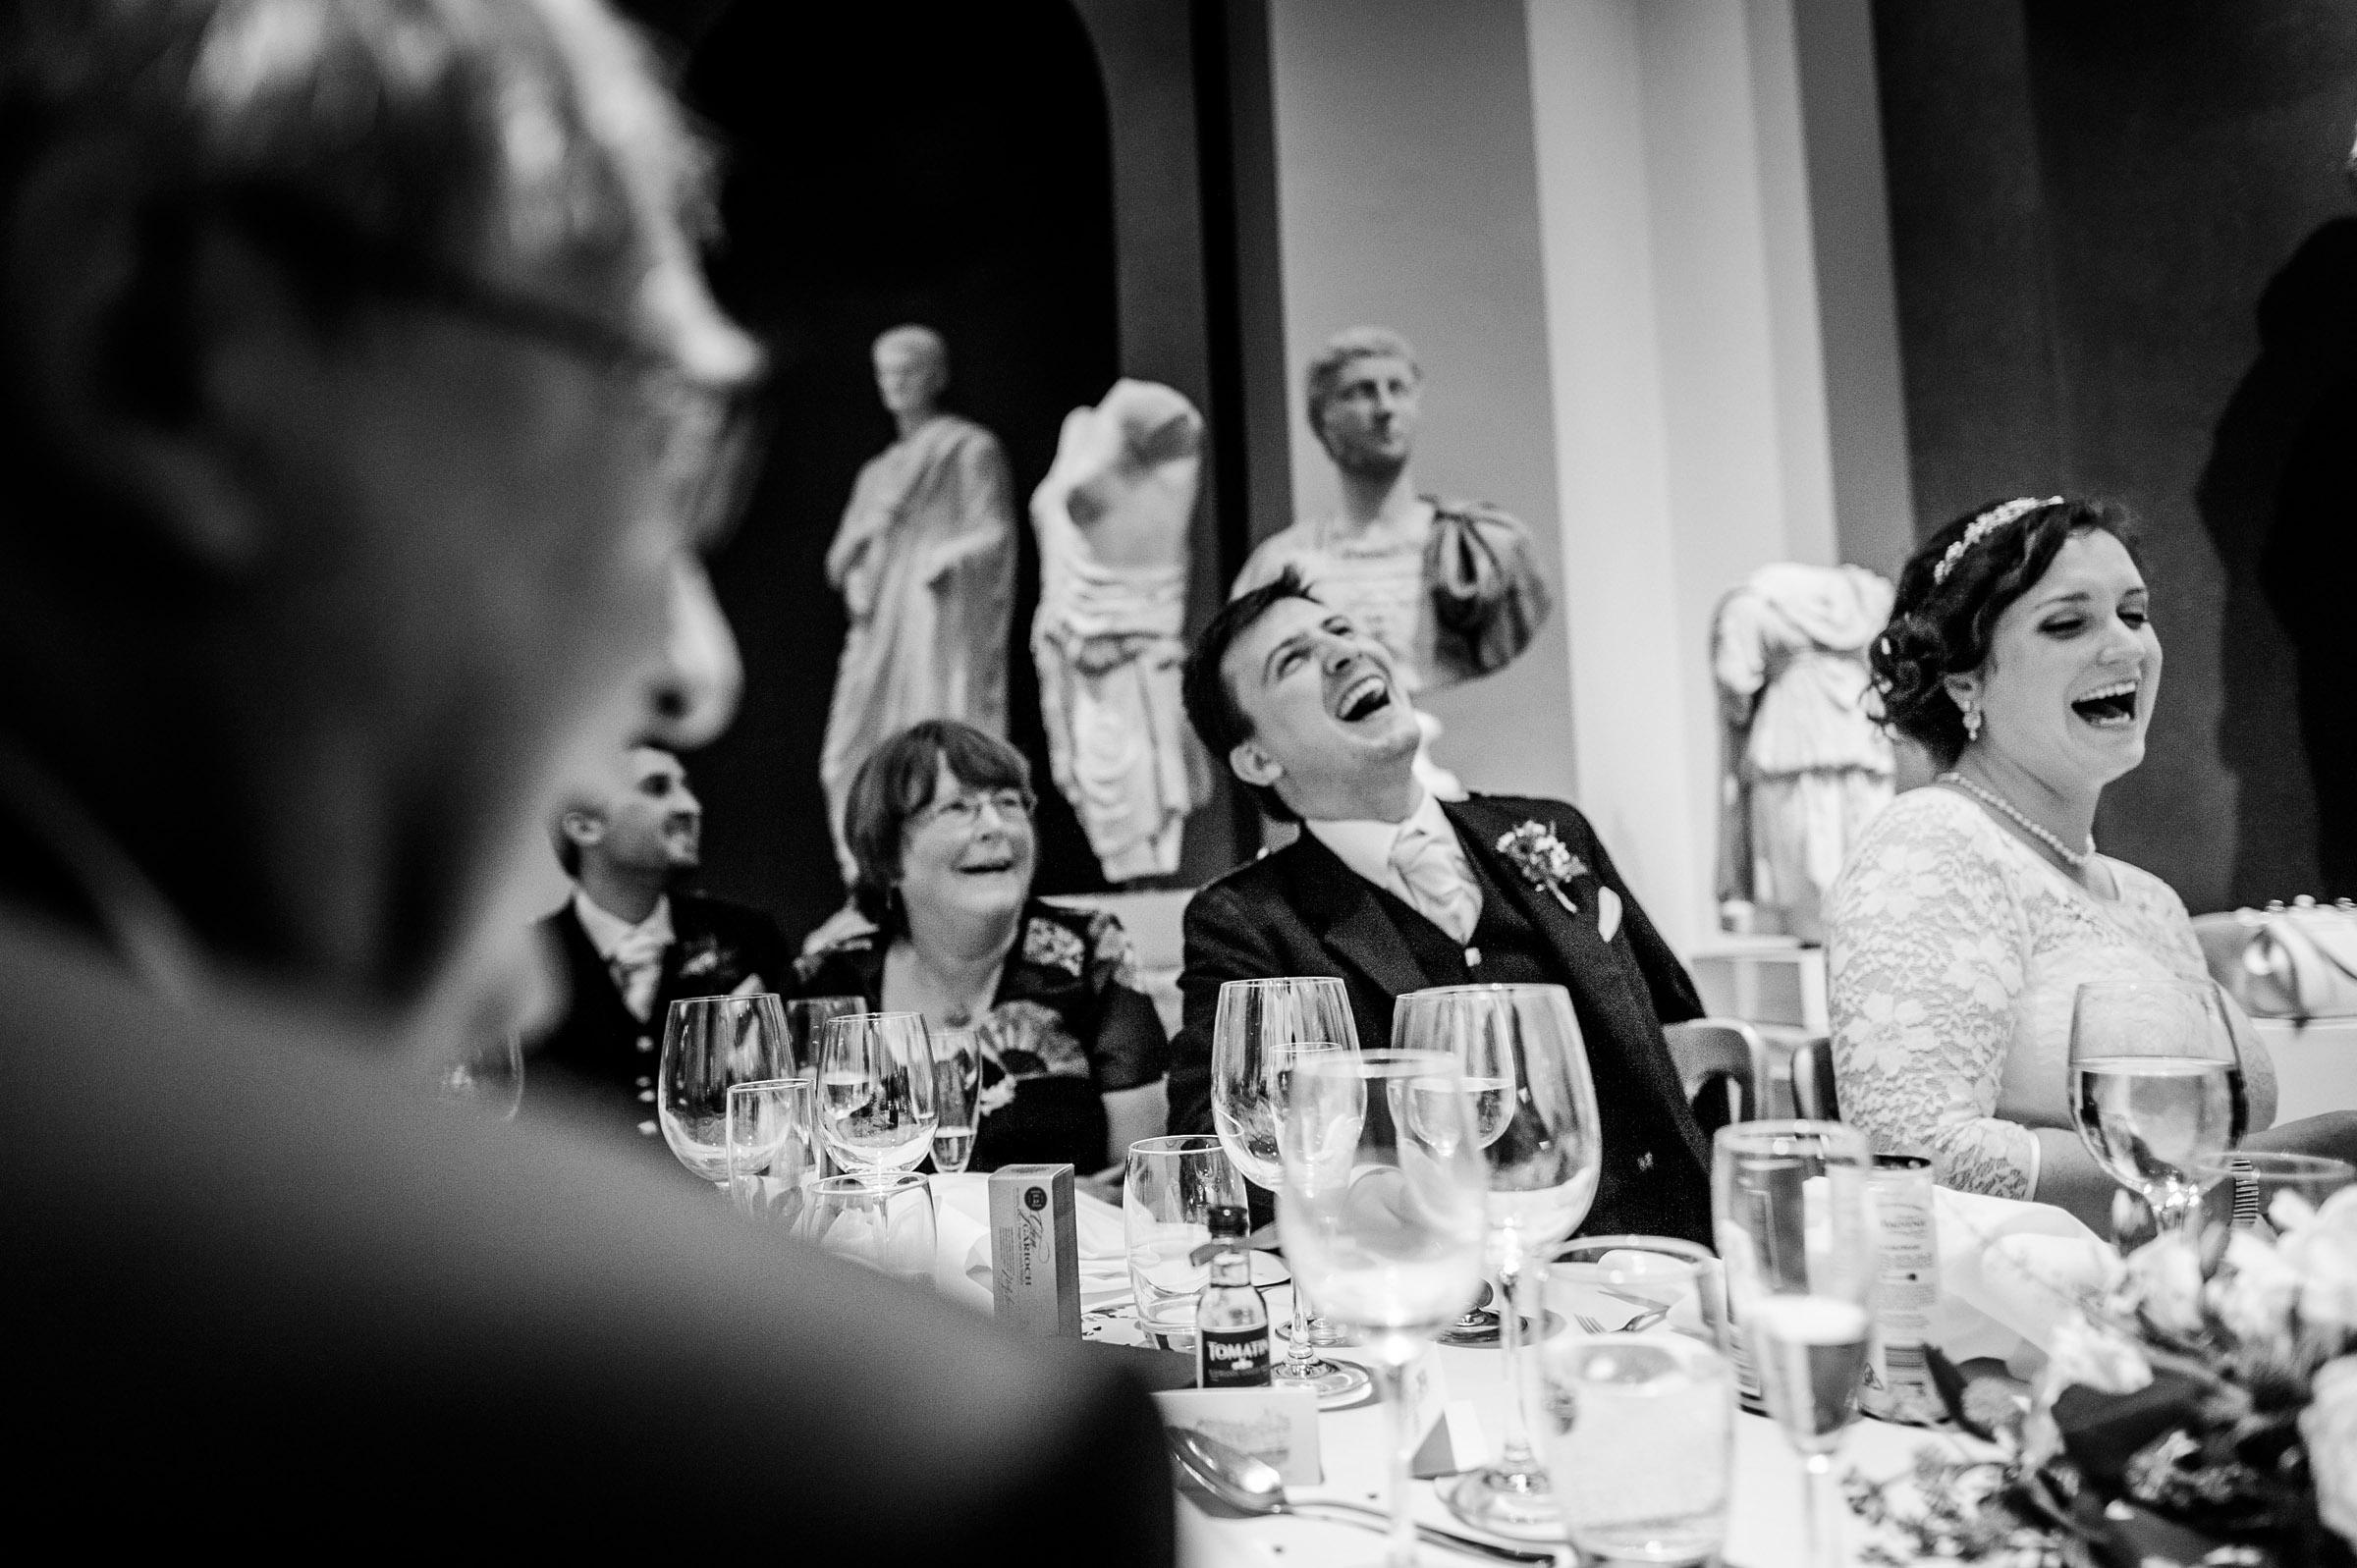 Ashmolean-Museum-Wedding-Pictures-0064.jpg